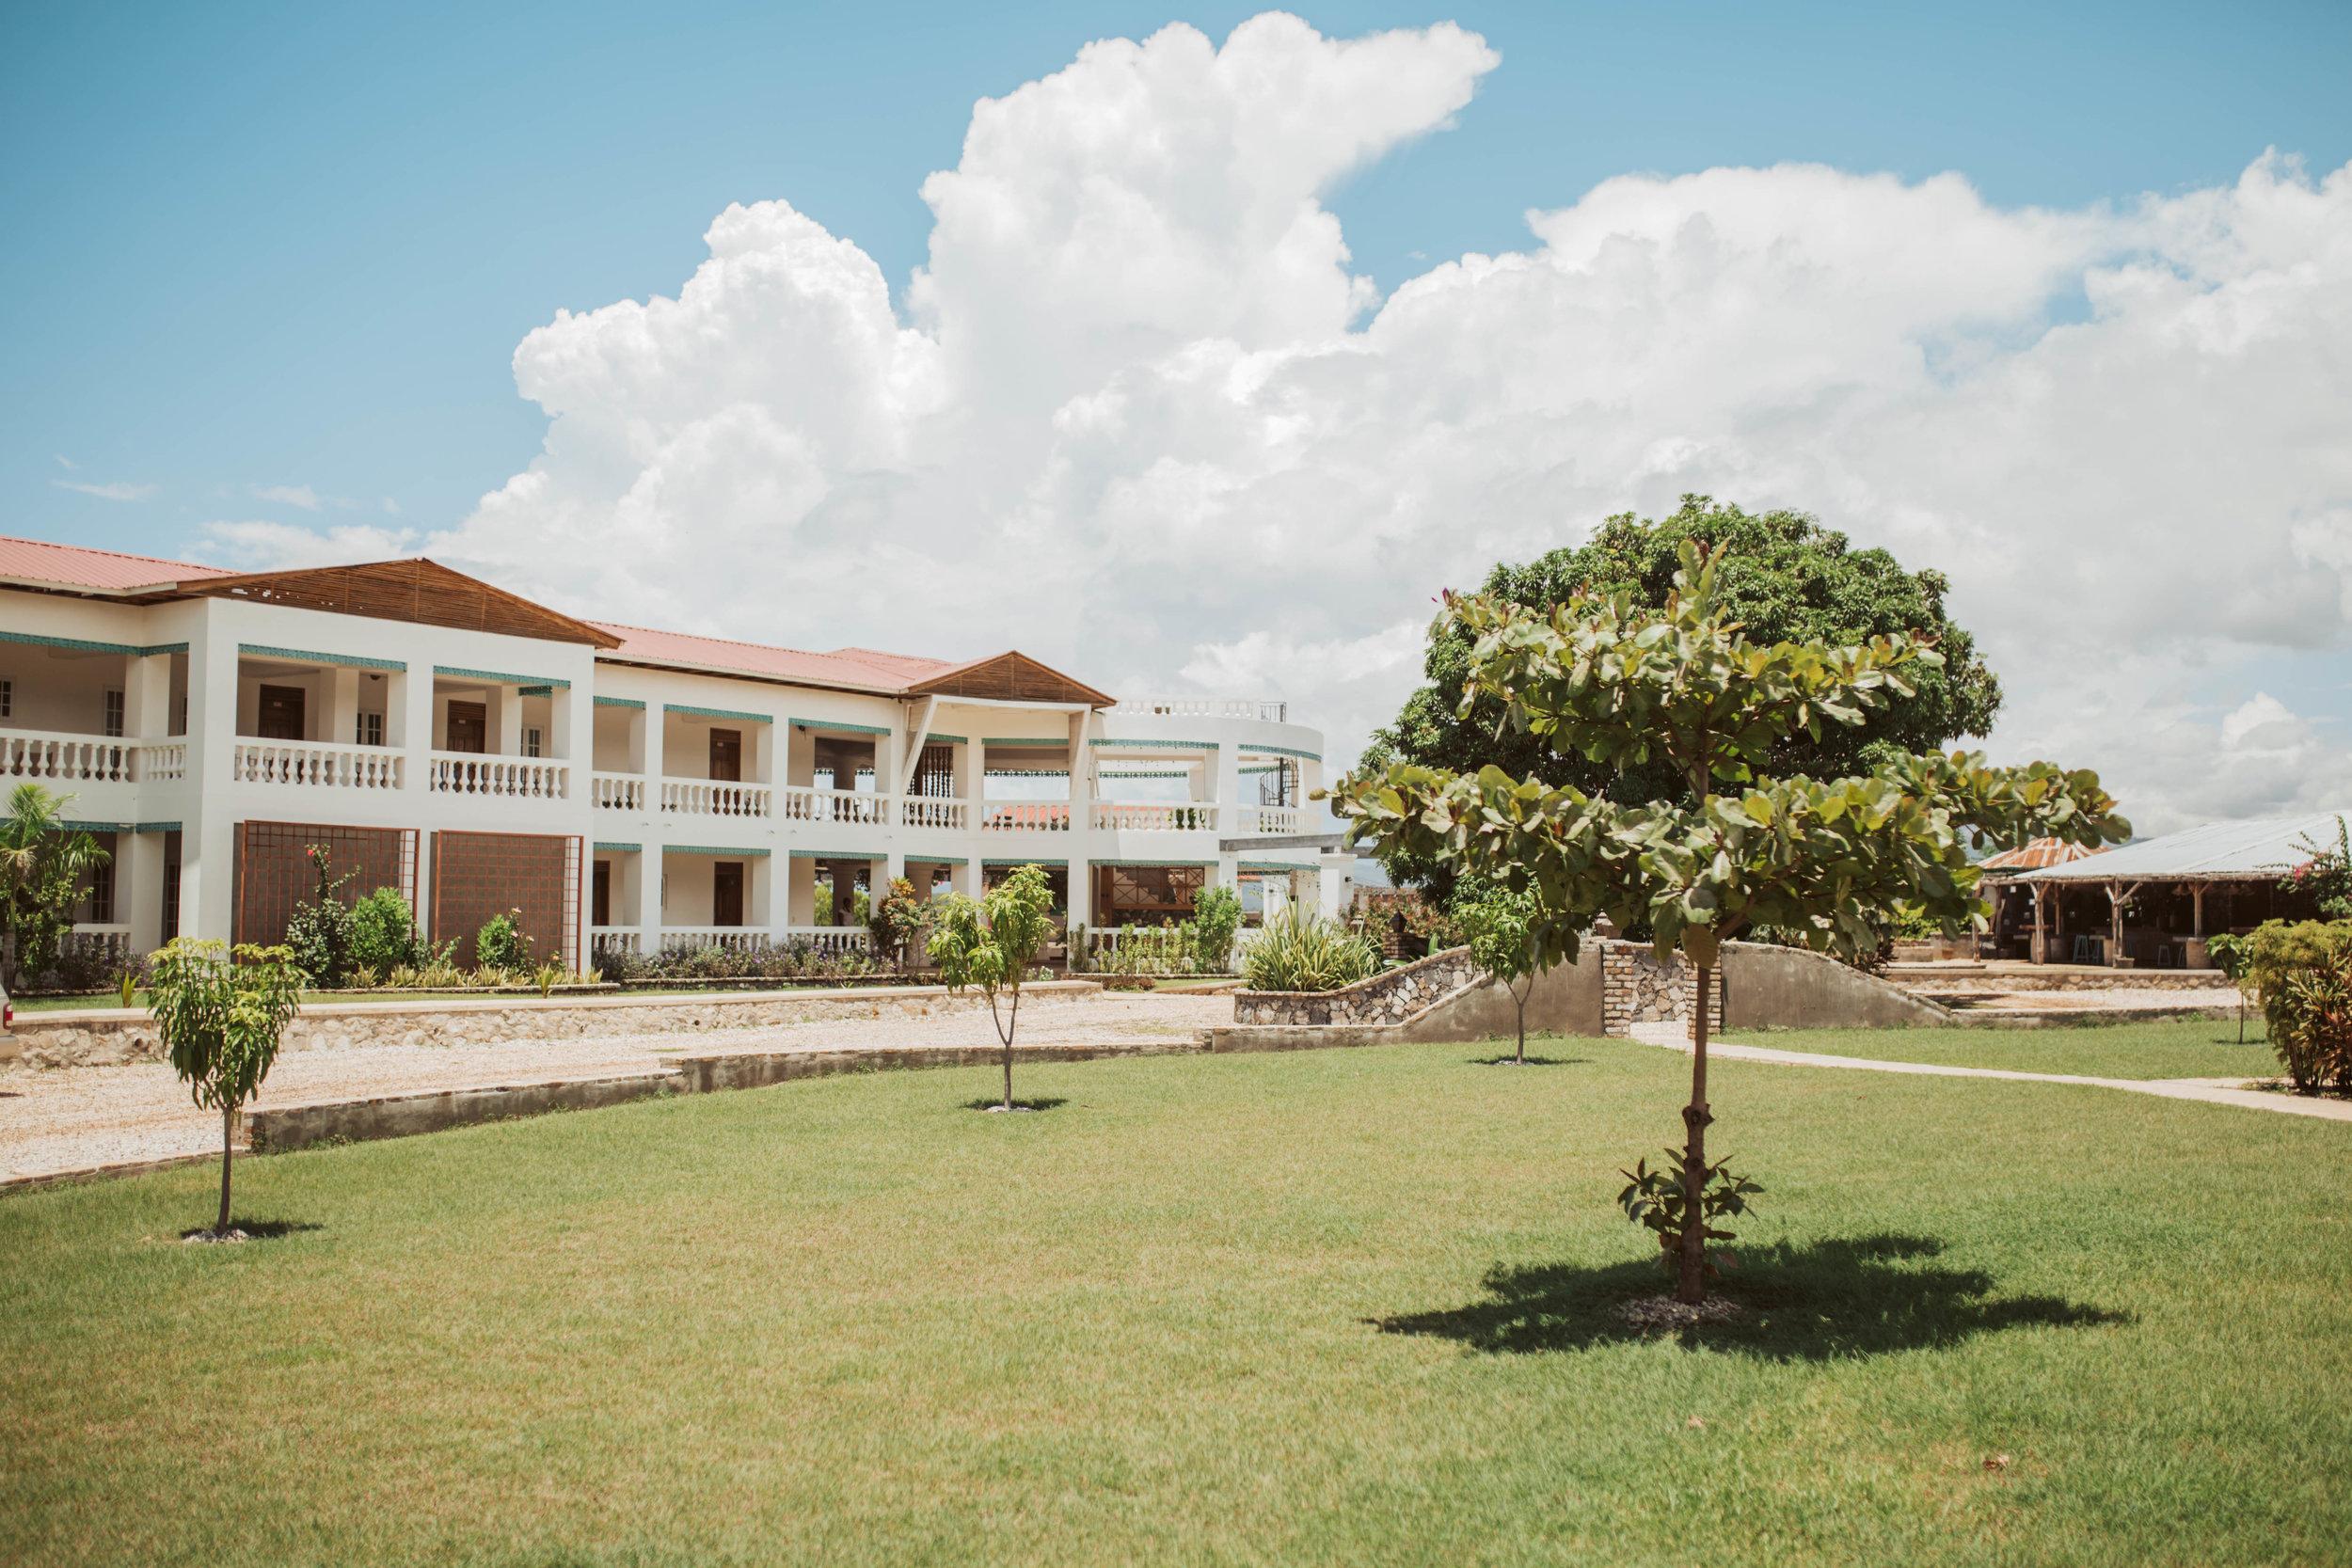 Take a trip to Haiti - Serve, Explore, Retreat!     TRIP INFO